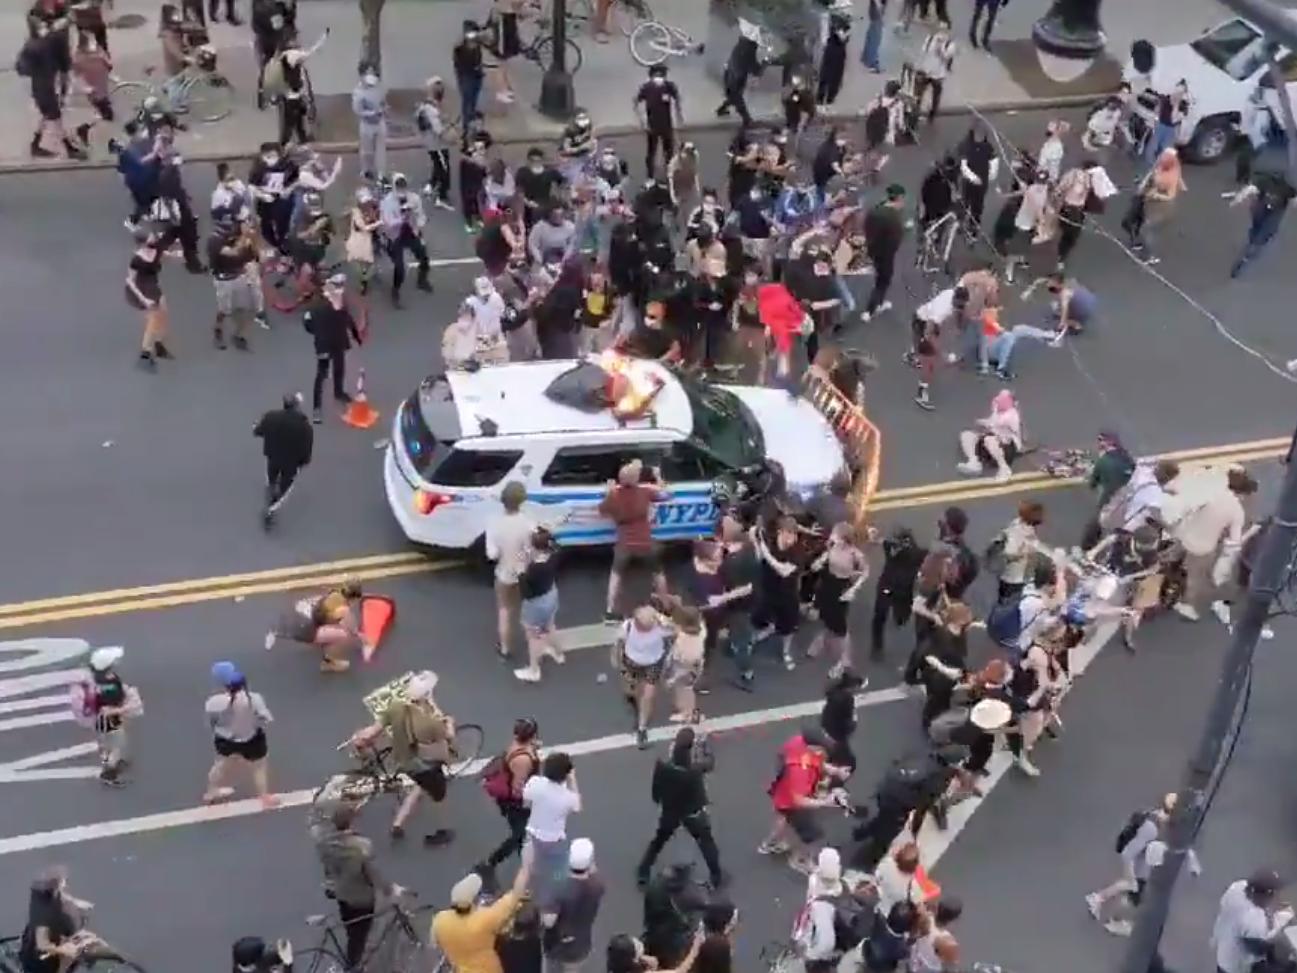 George Floyd protests: NYPD vehicle rams crowd of demonstrators in Brooklyn